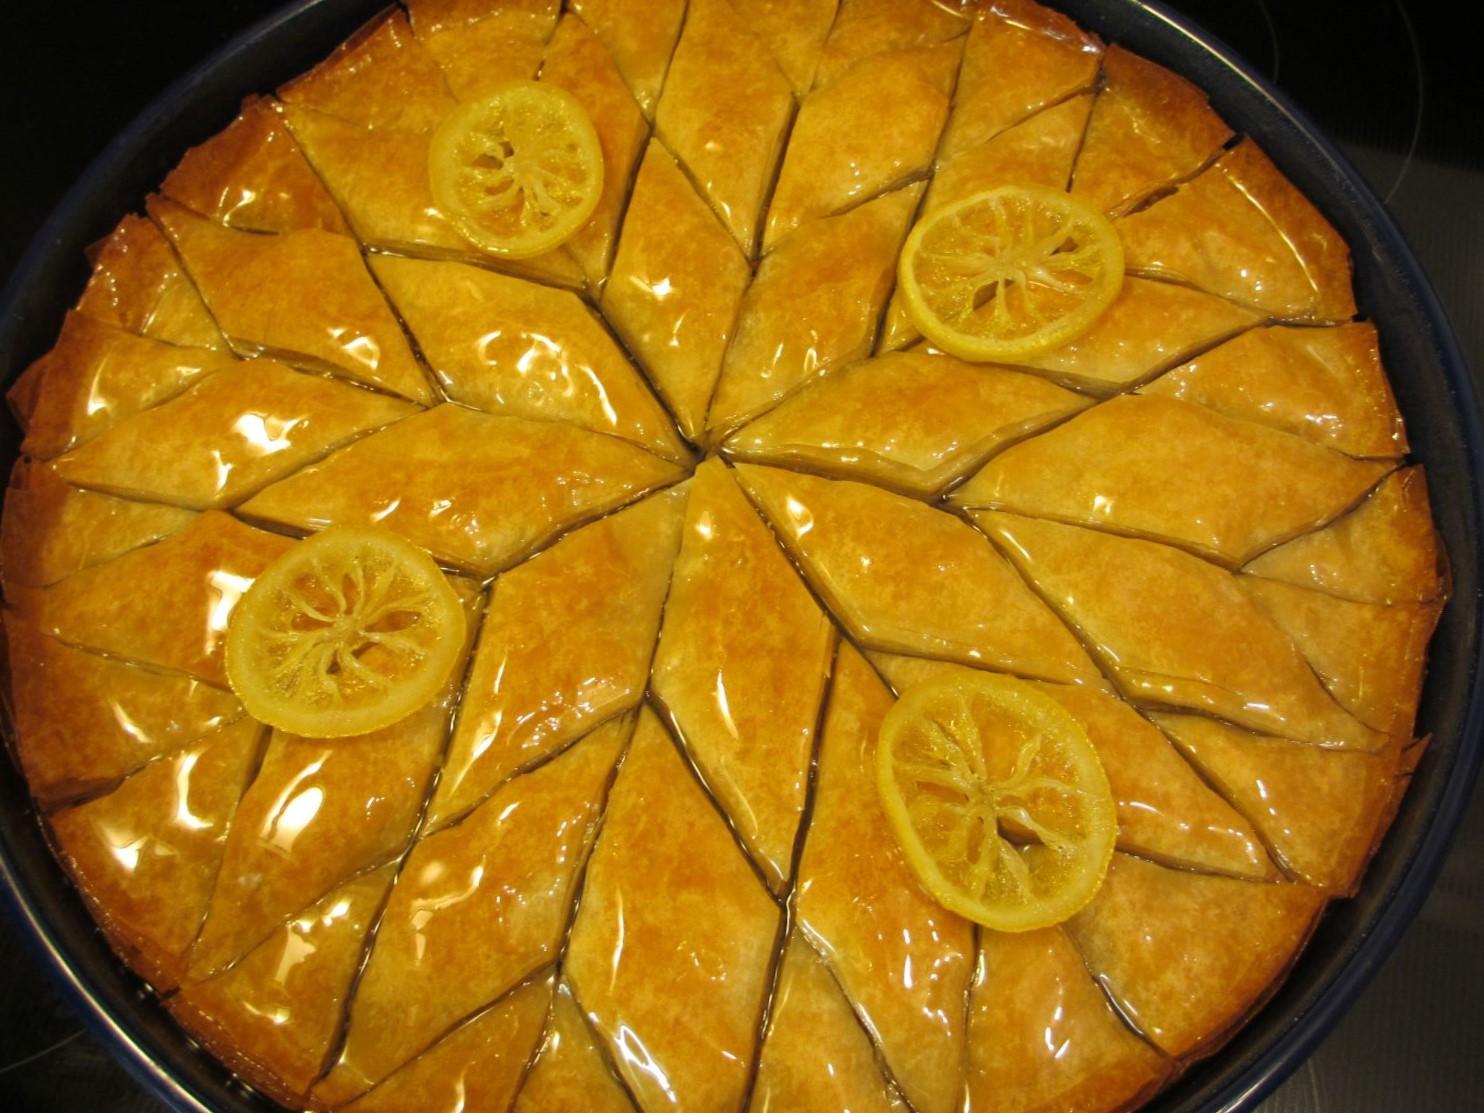 Baklava with lemon circles